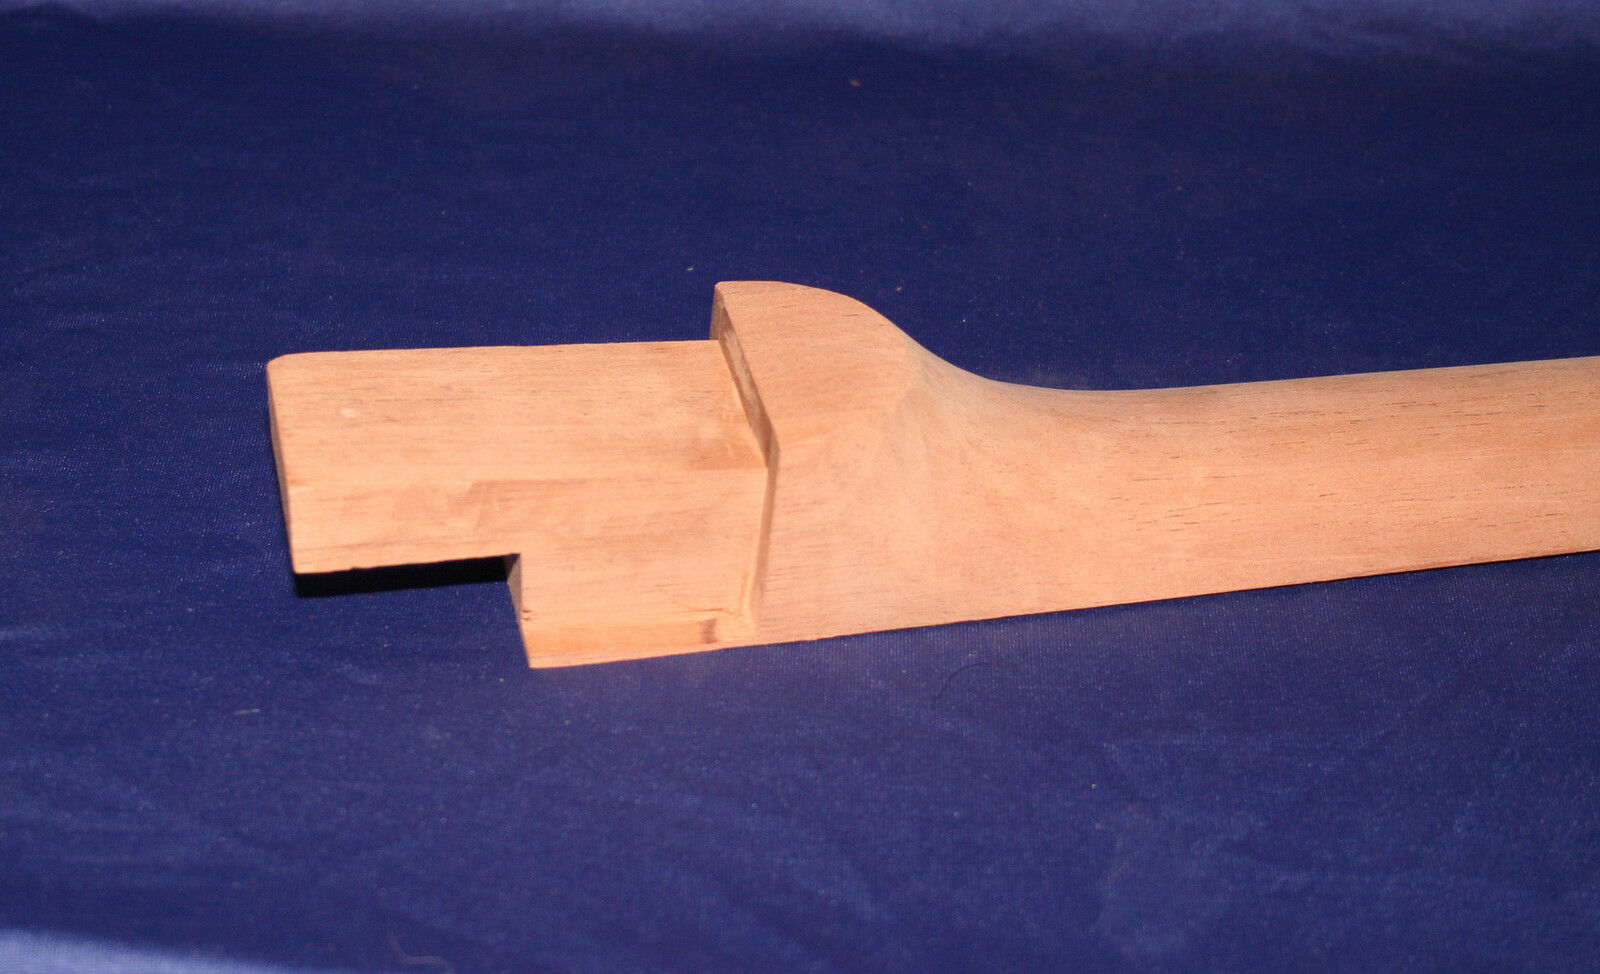 Neck Blank Thin Hollow BodyModel300 17deg.hdsk x 4 deg nk.jt. Honduras Mahogany